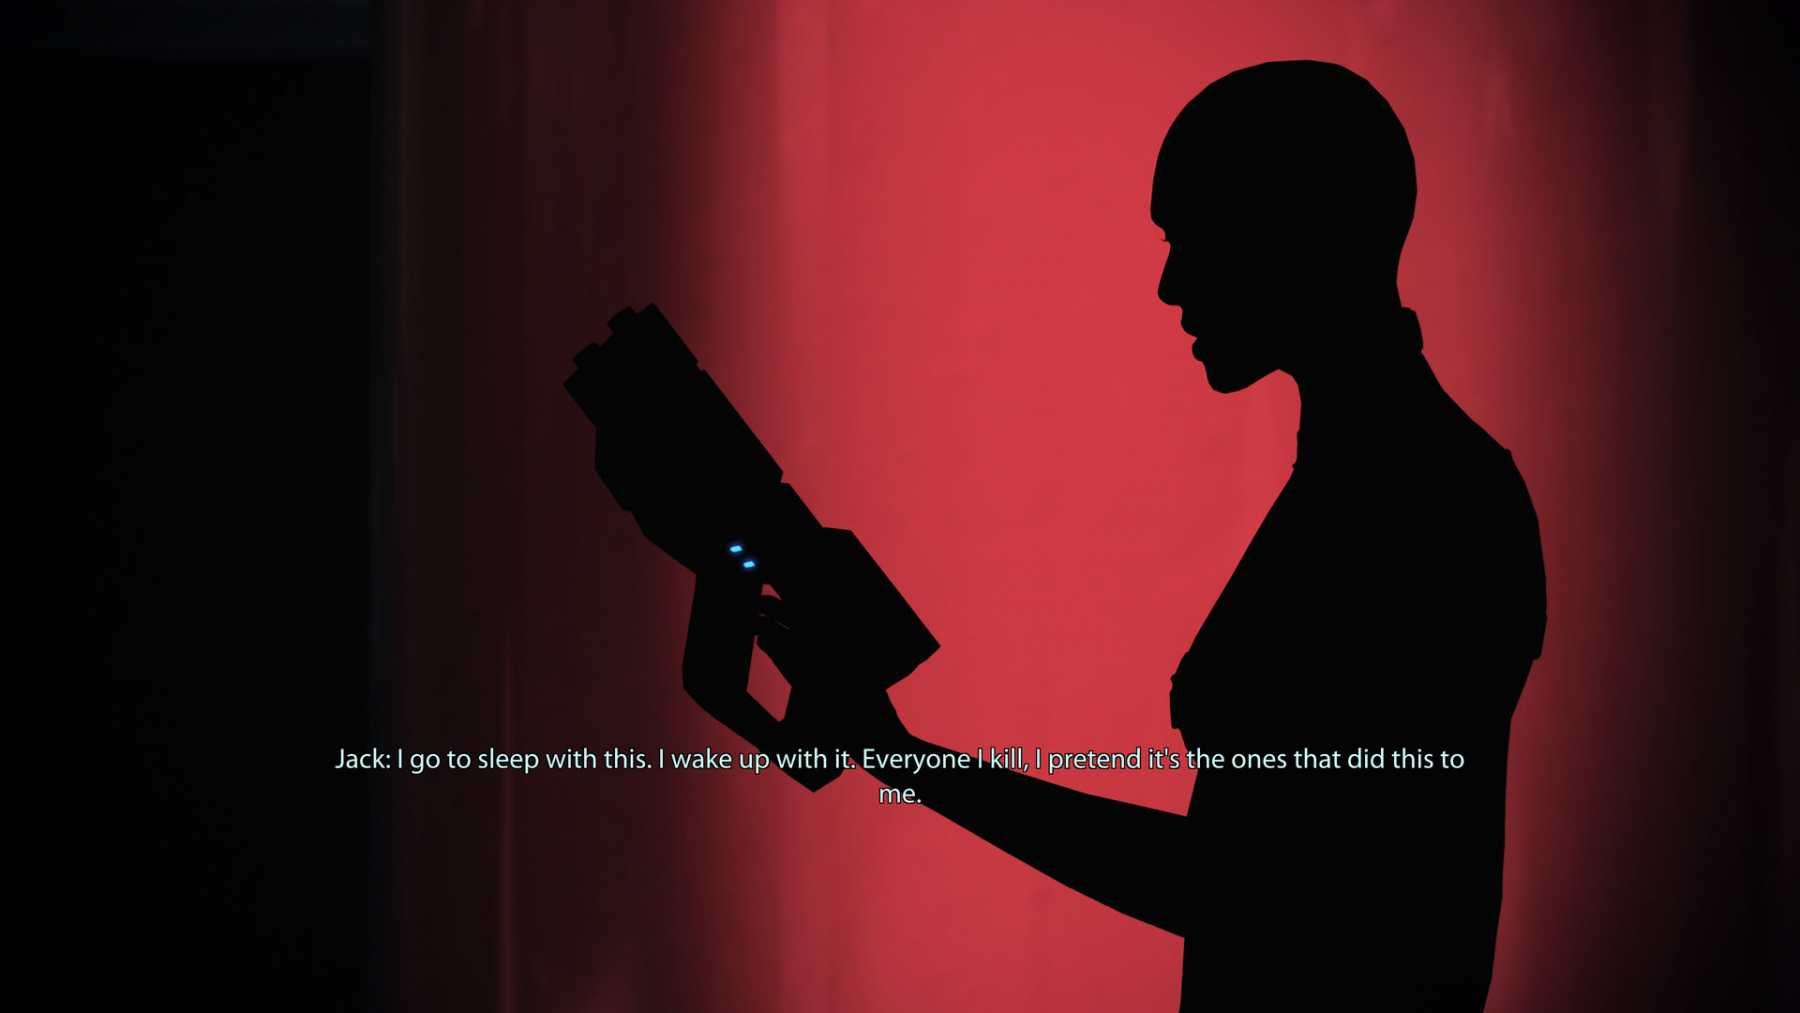 Mass-Effect-2-Silhouette-Jack